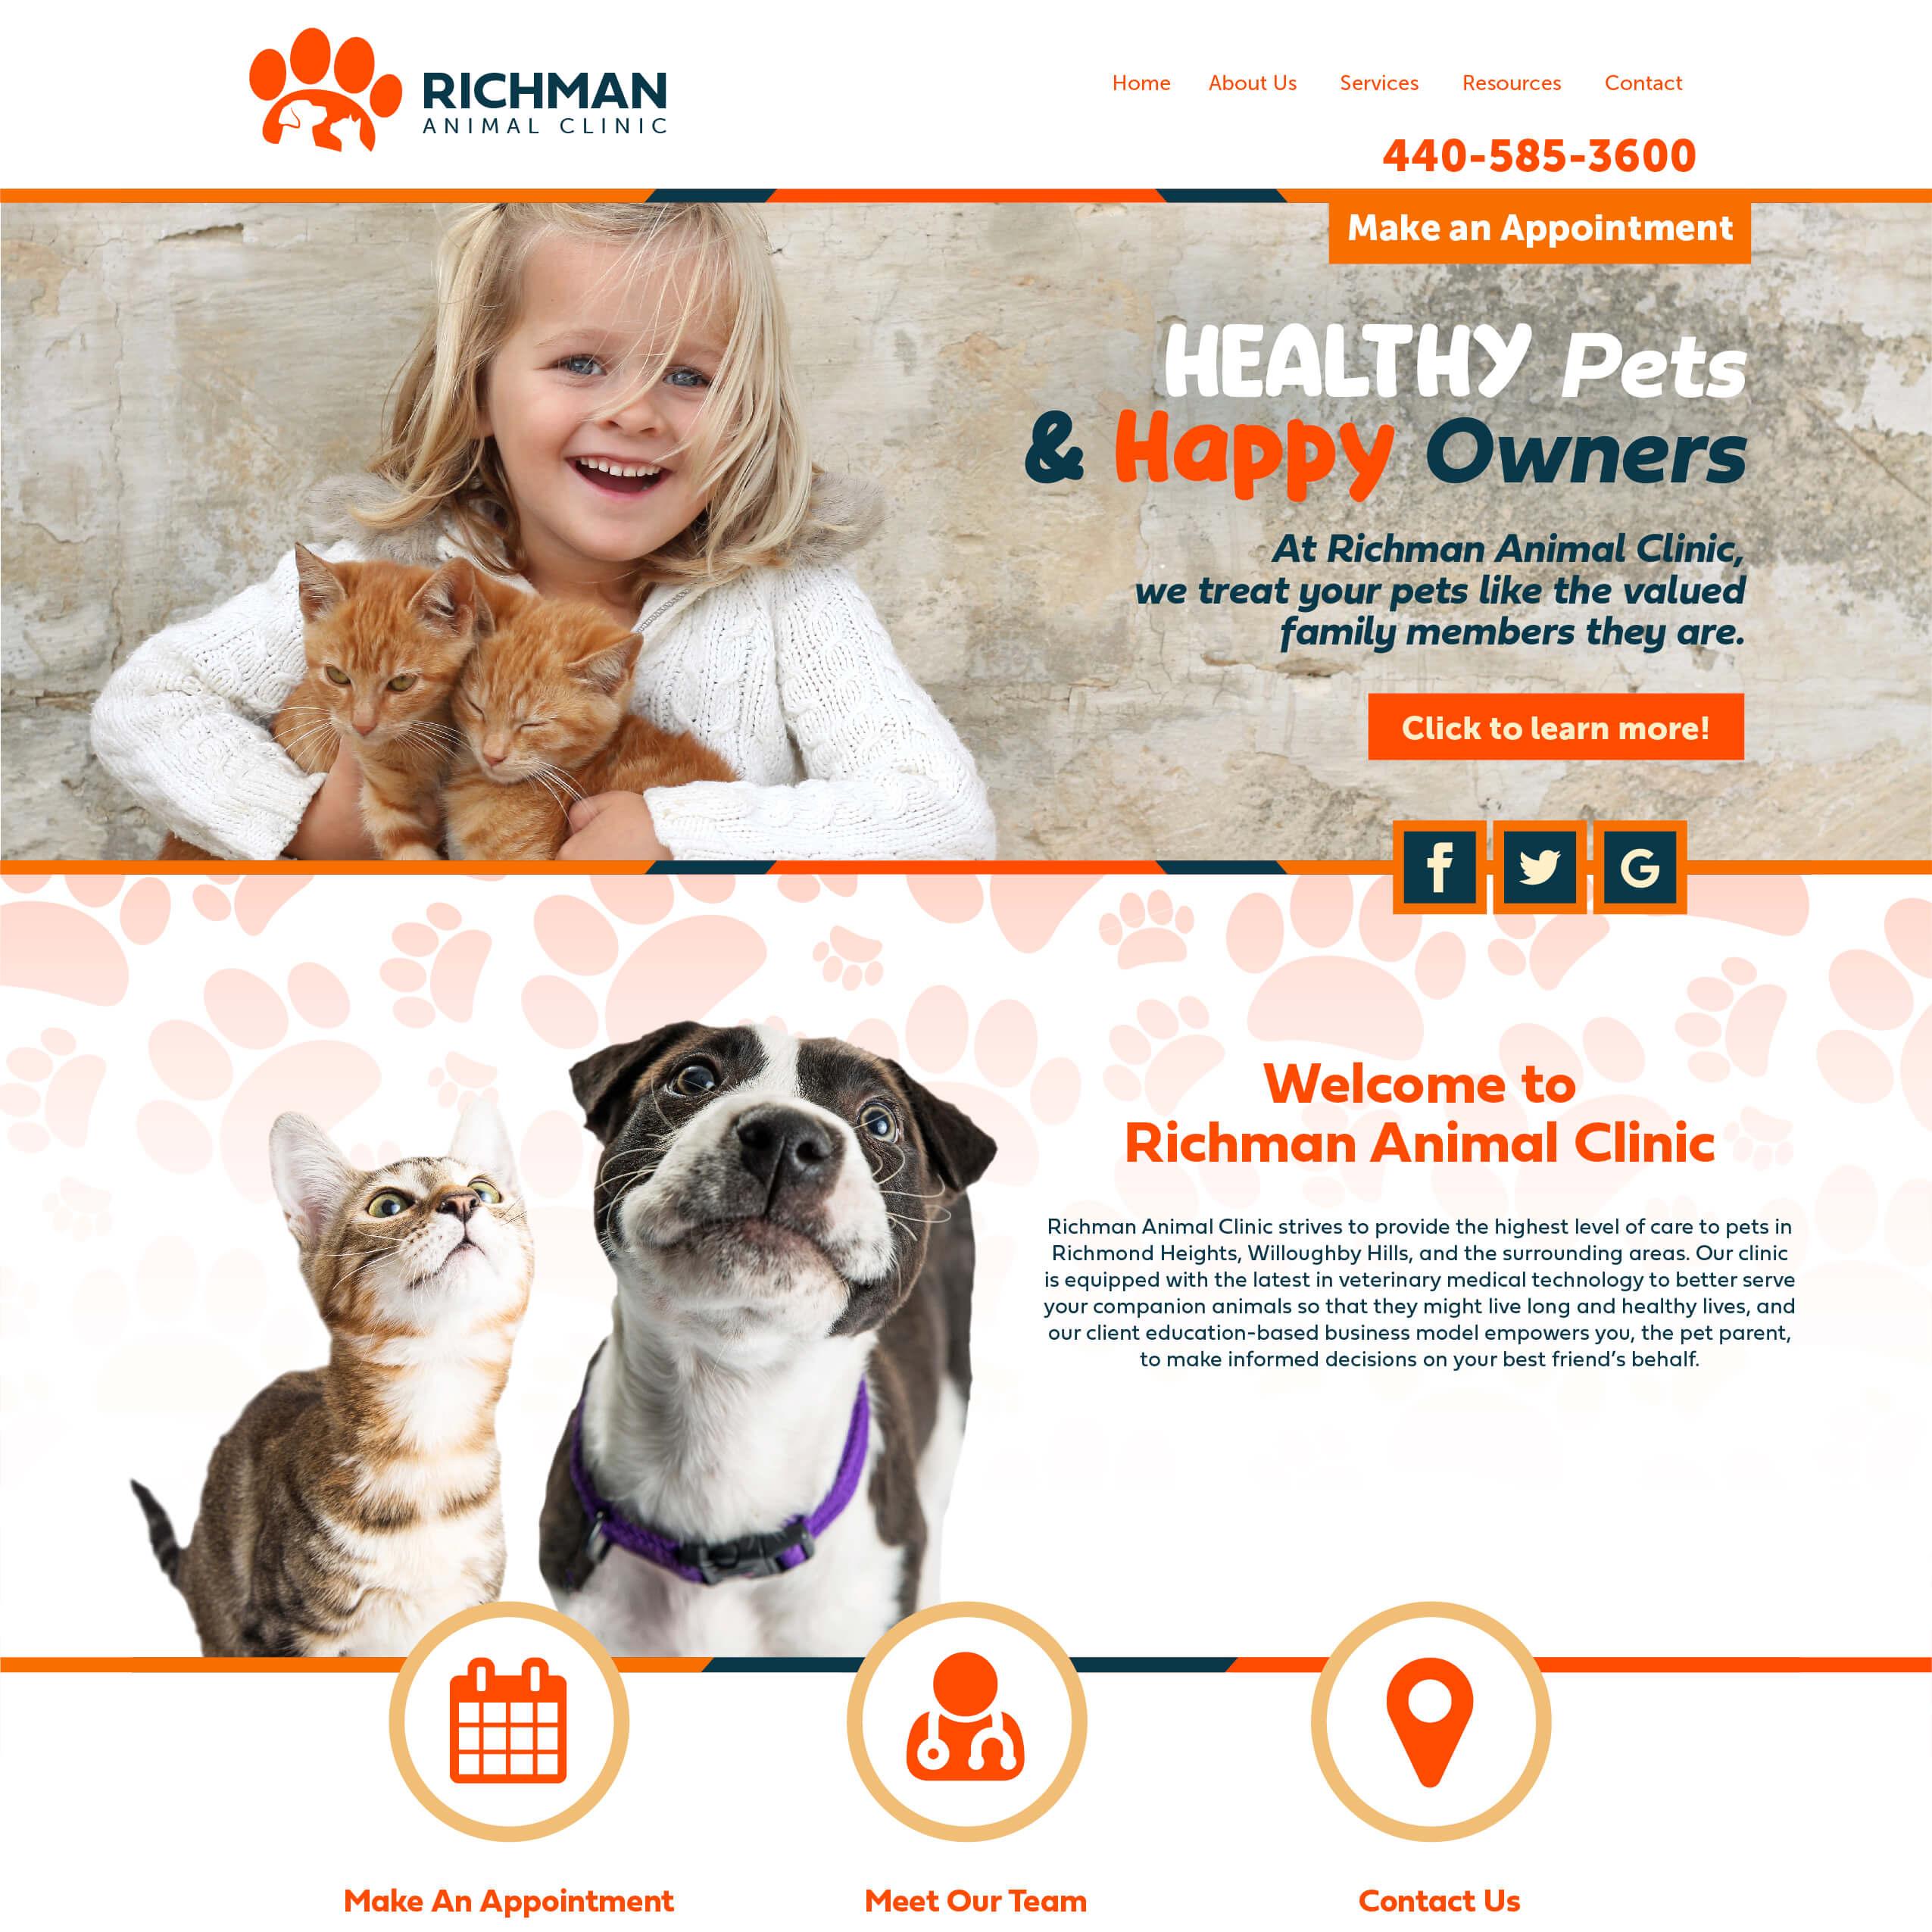 Richman Animal Clinic